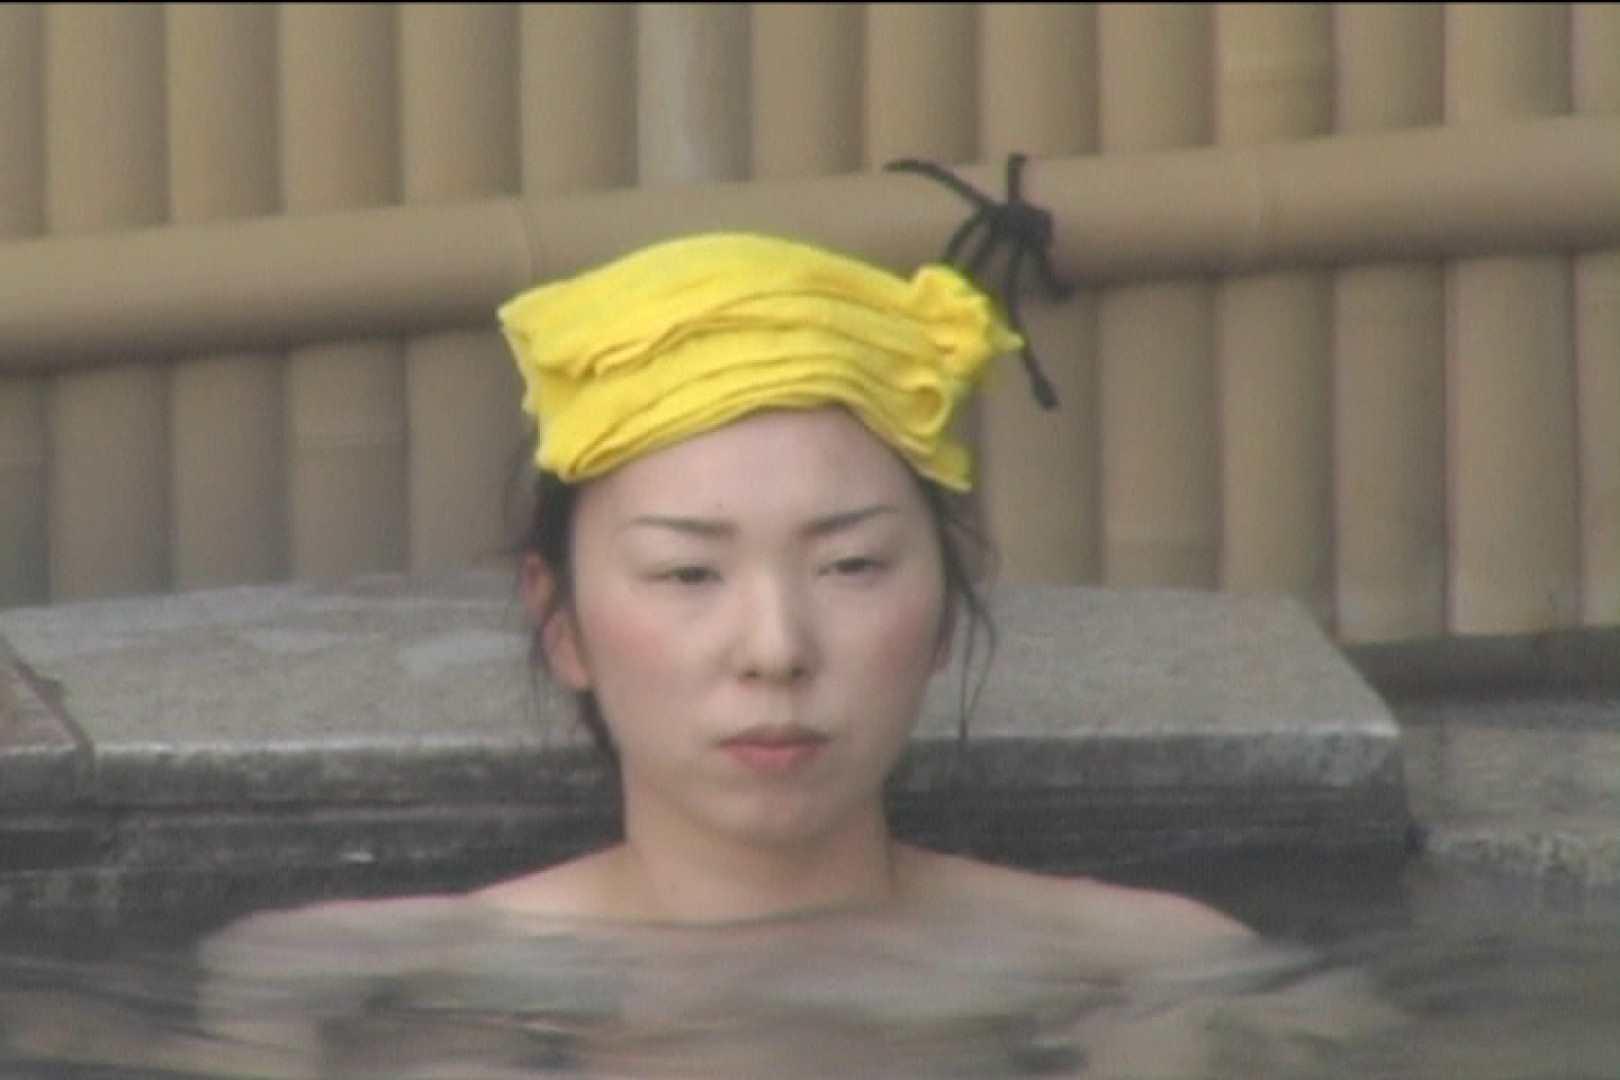 Aquaな露天風呂Vol.529 盗撮映像  51Pix 13